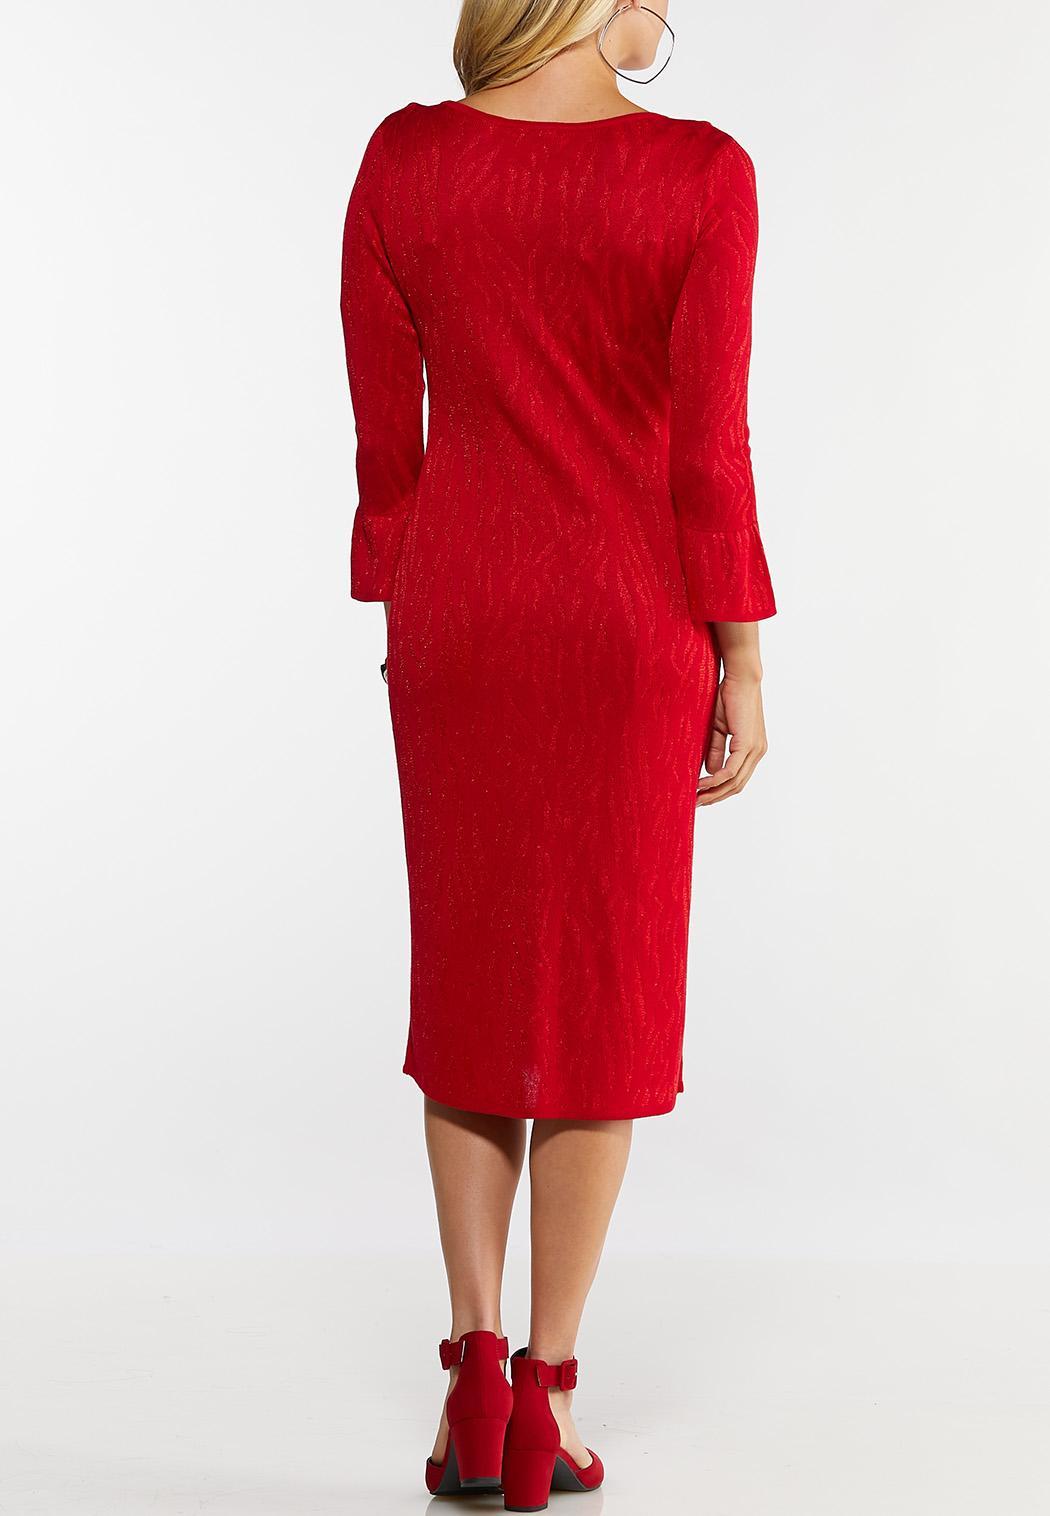 Plus Size Red Zebra Print Sweater Dress (Item #44017697)